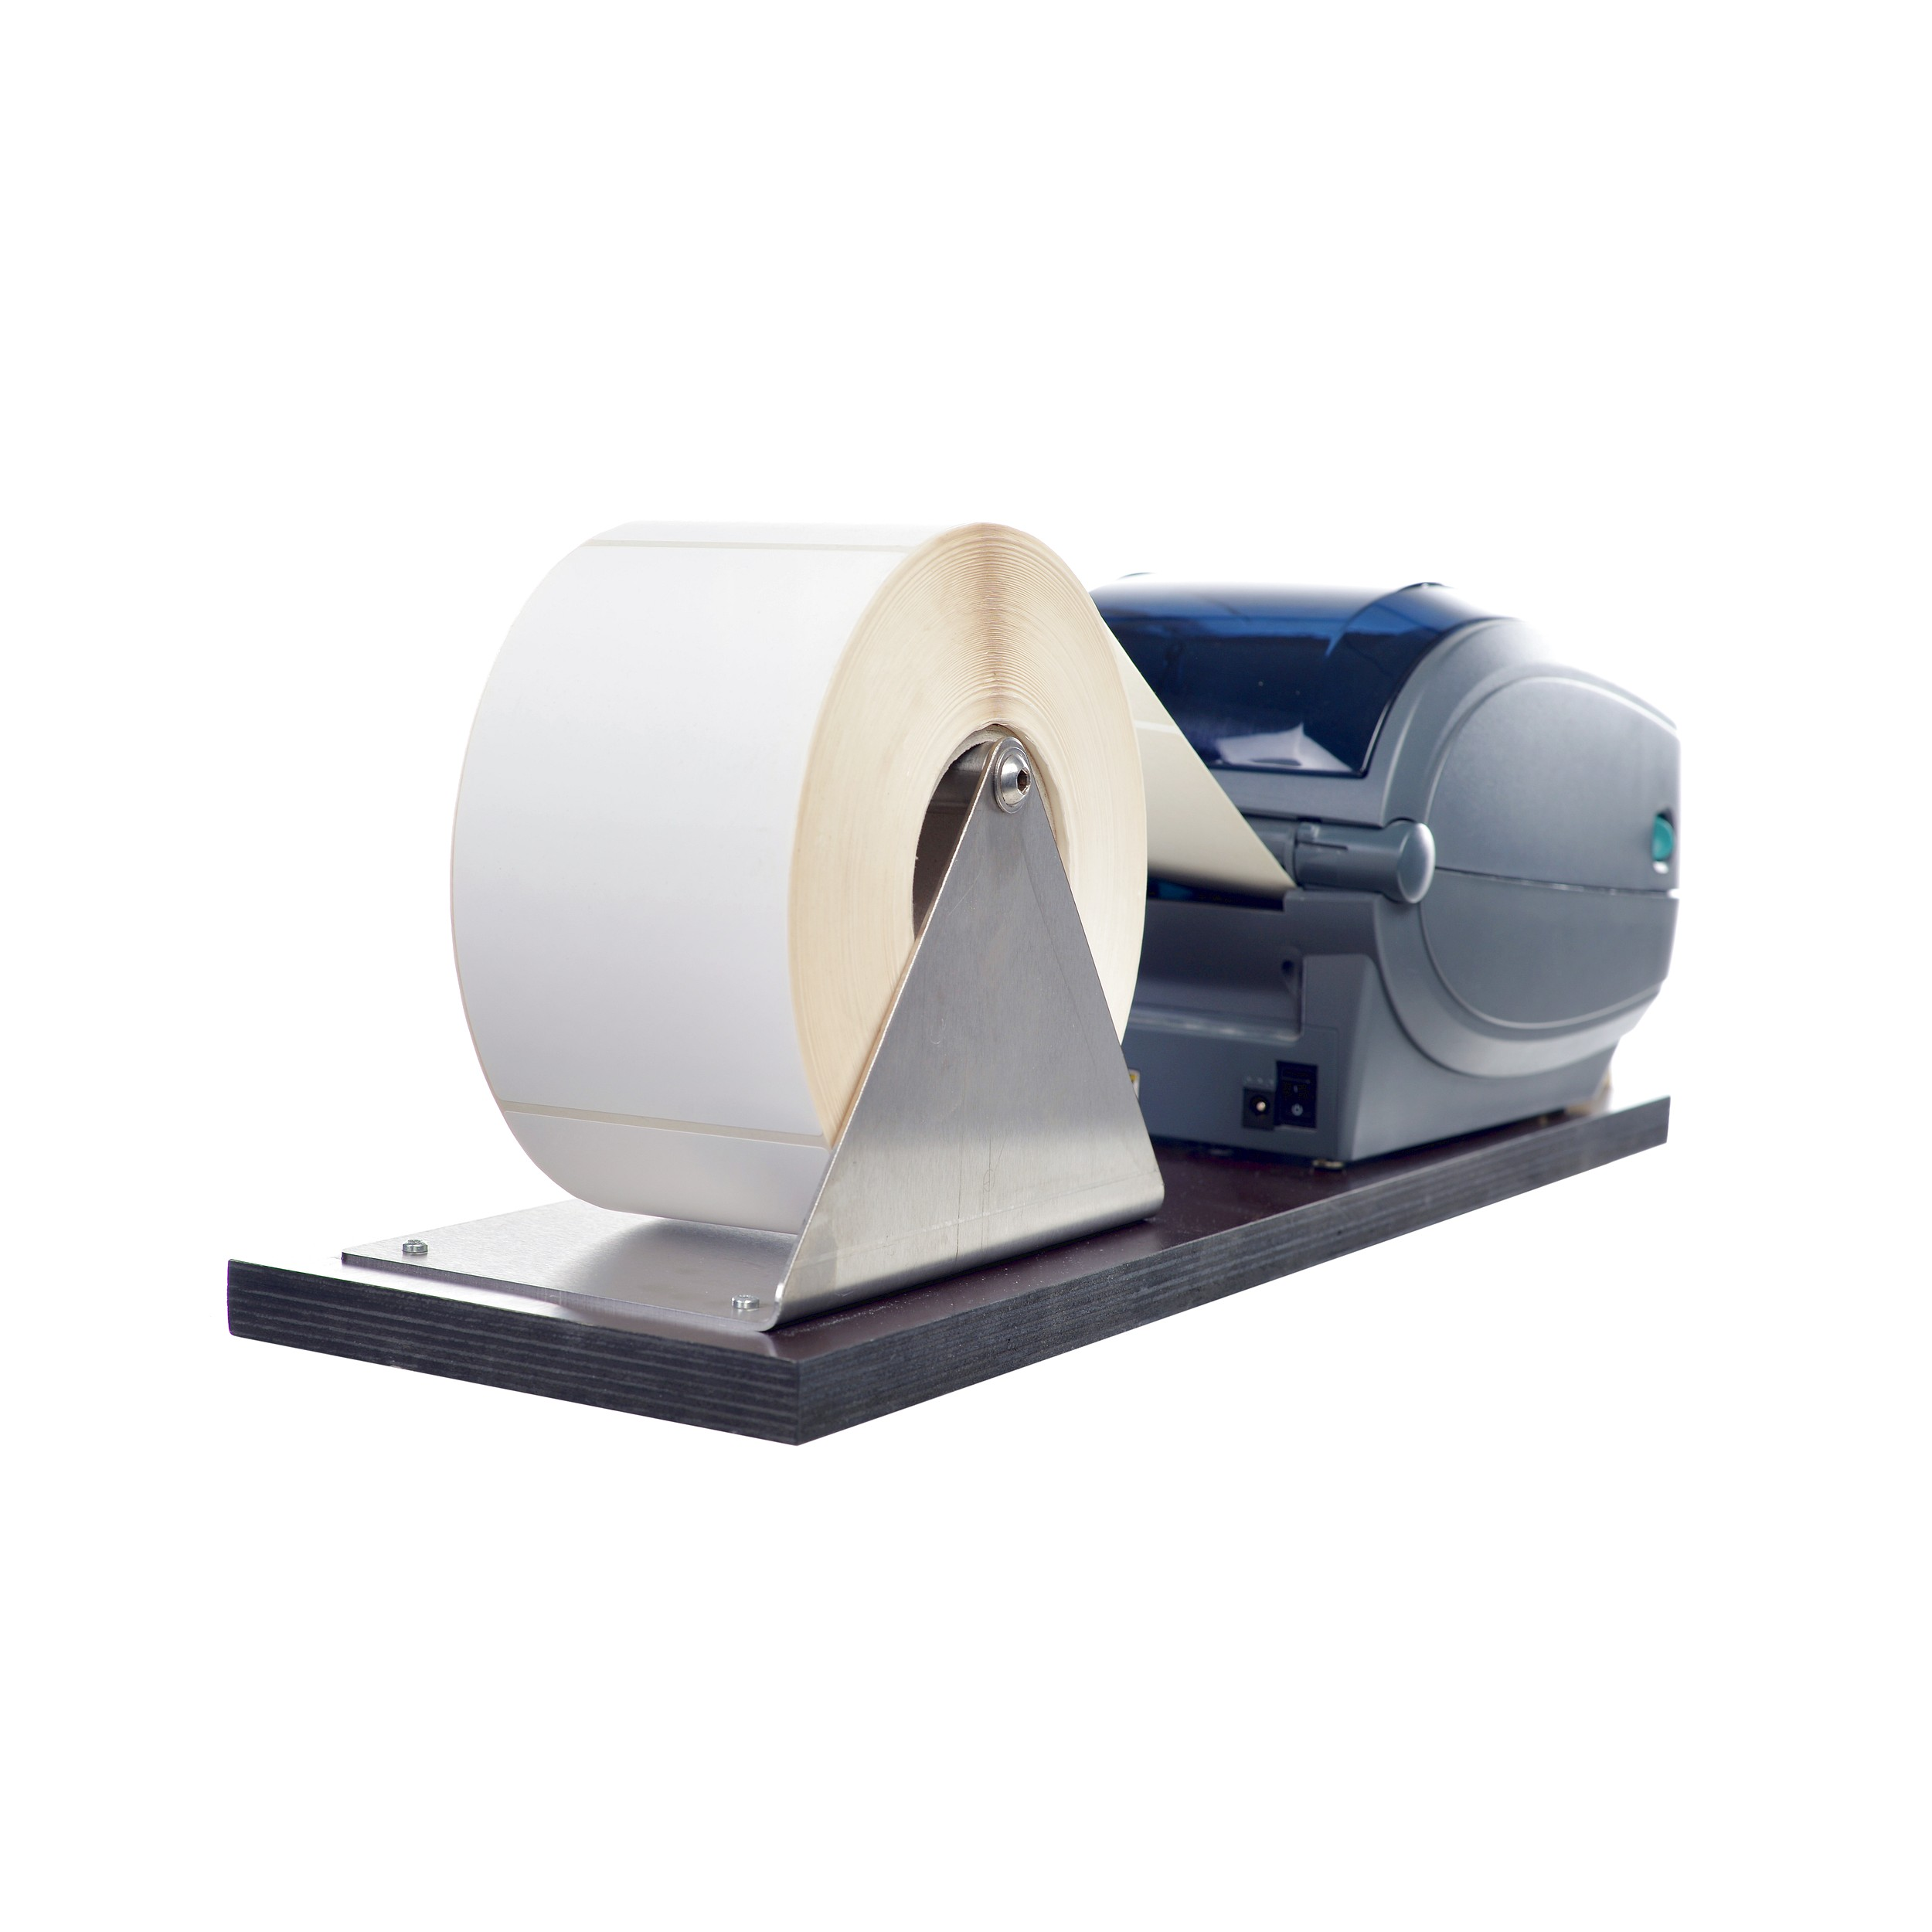 Etikettendrucker Etiketten Drucken Rolle Versandetiketten Rollenhalterung Halterung Versand Logistik Hardware 2